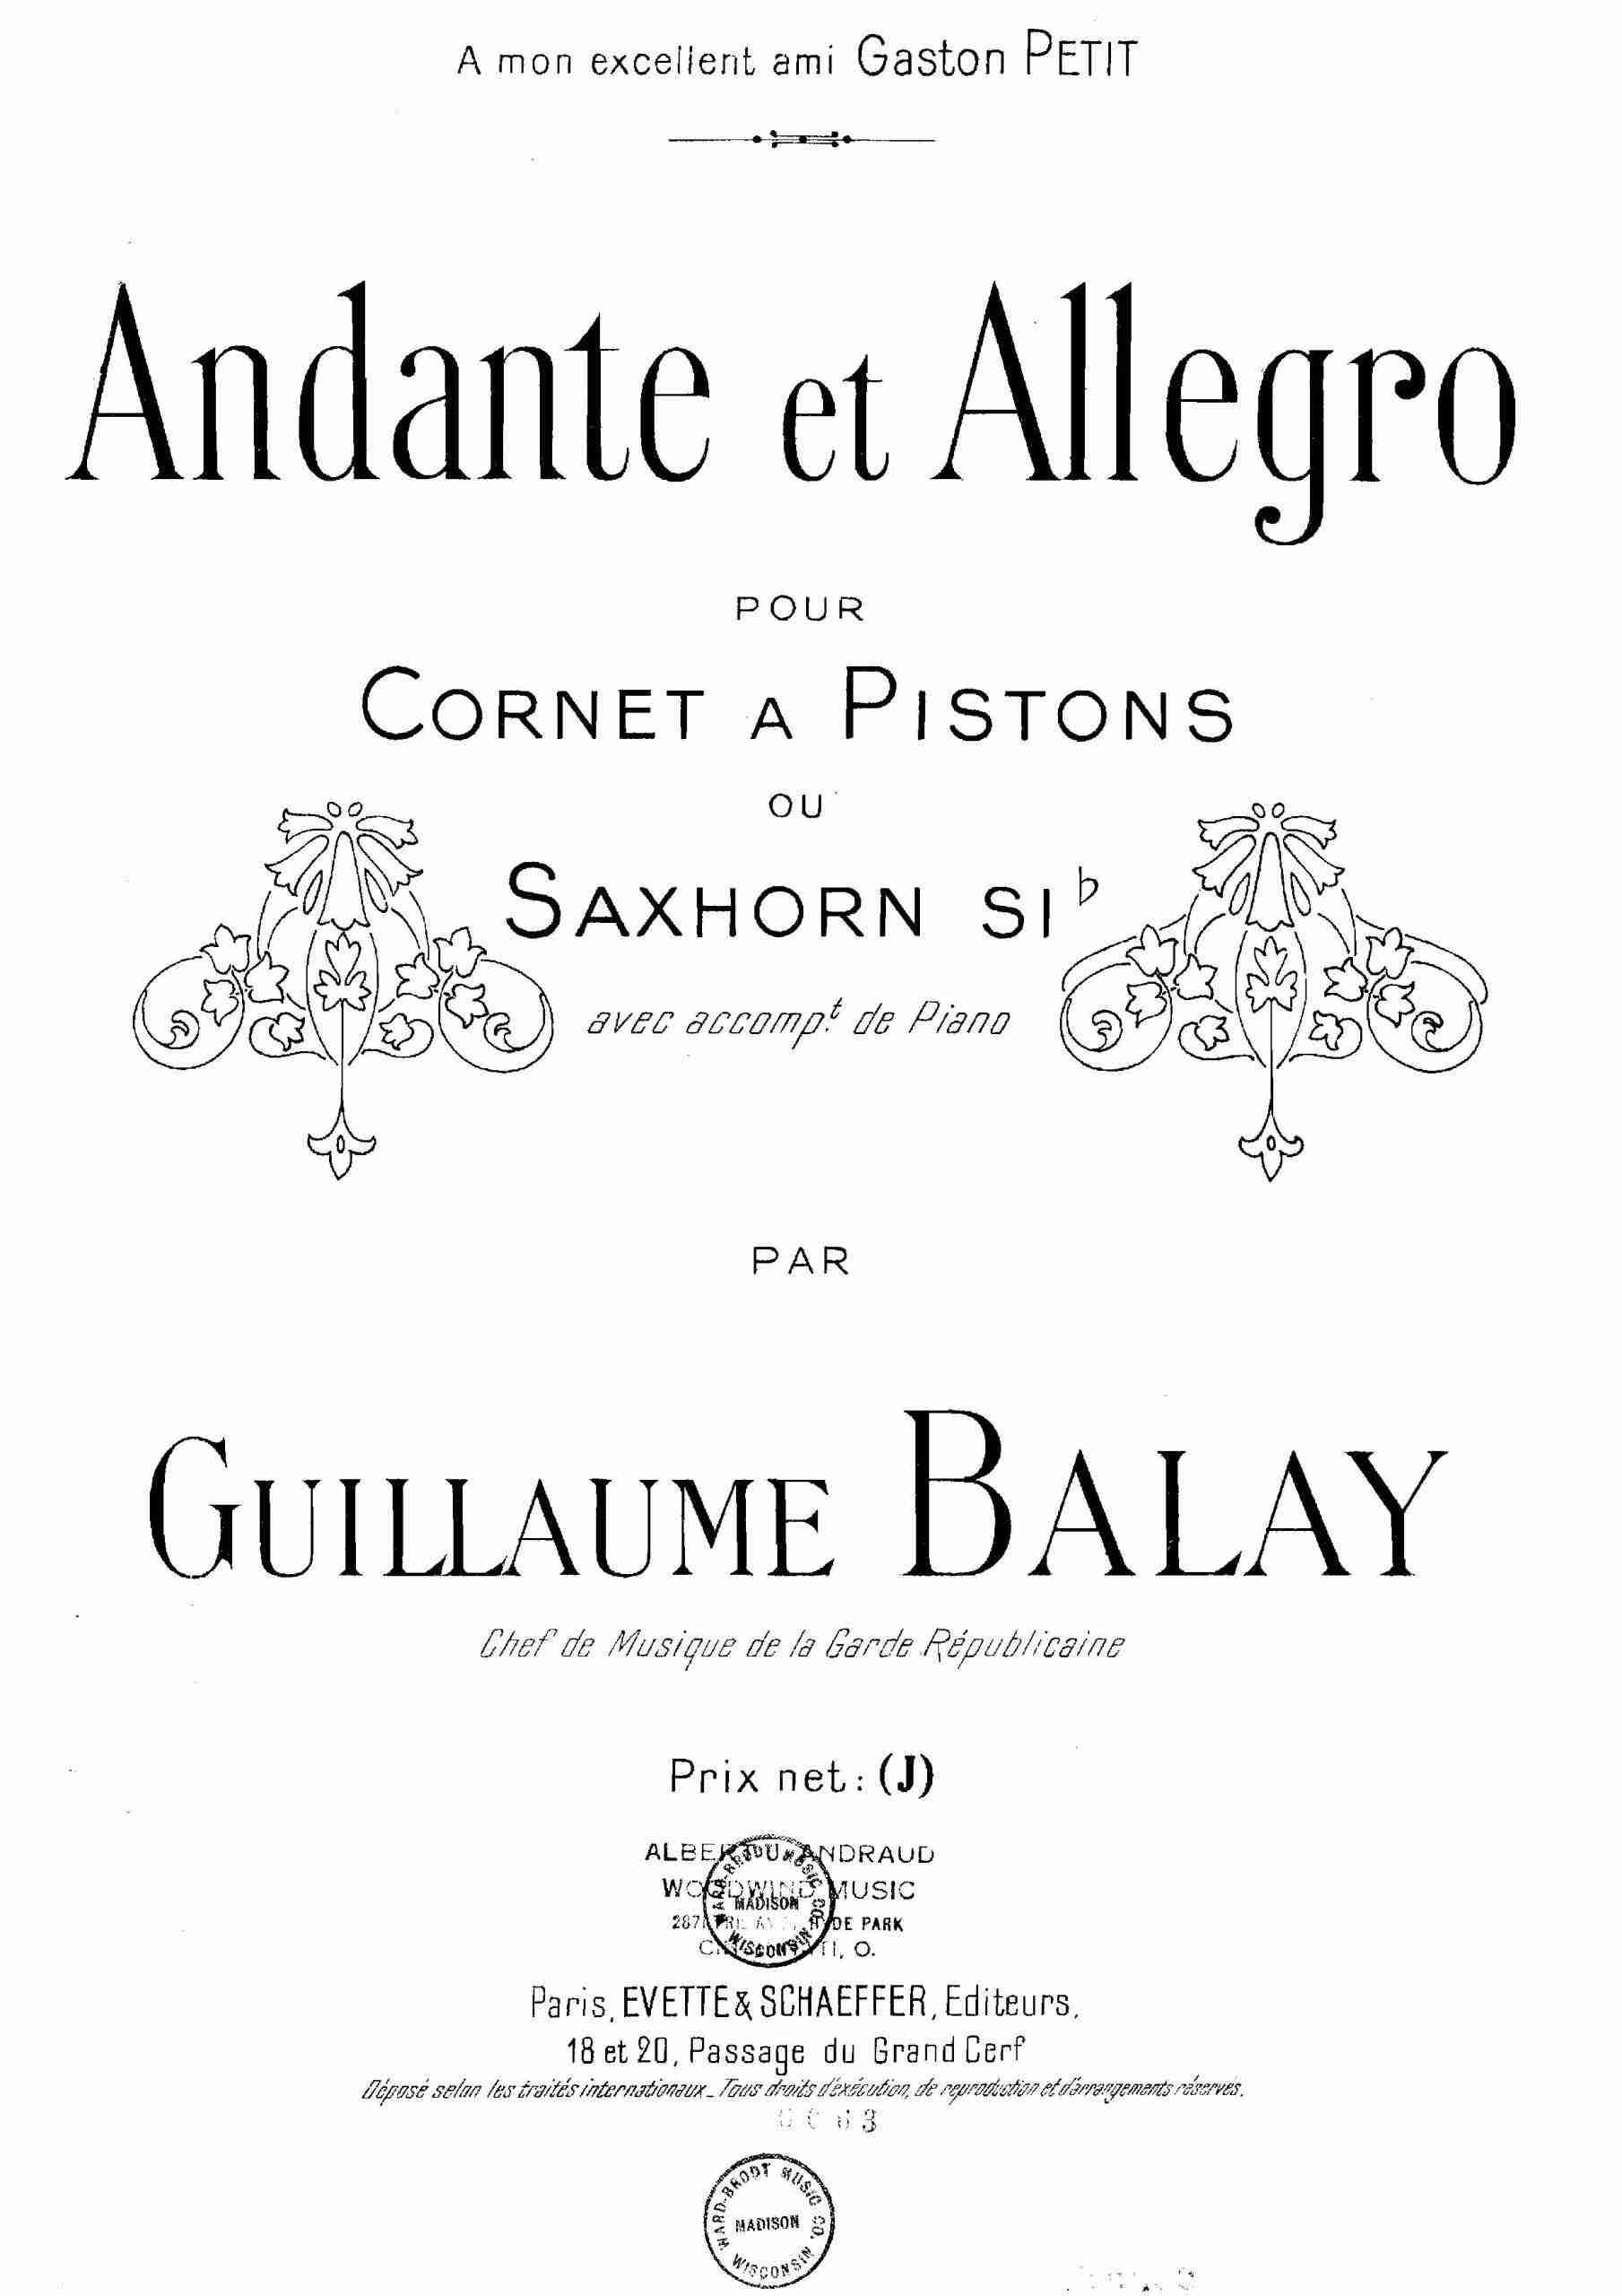 Balay, Guillaume - Andante et allegro (piano)